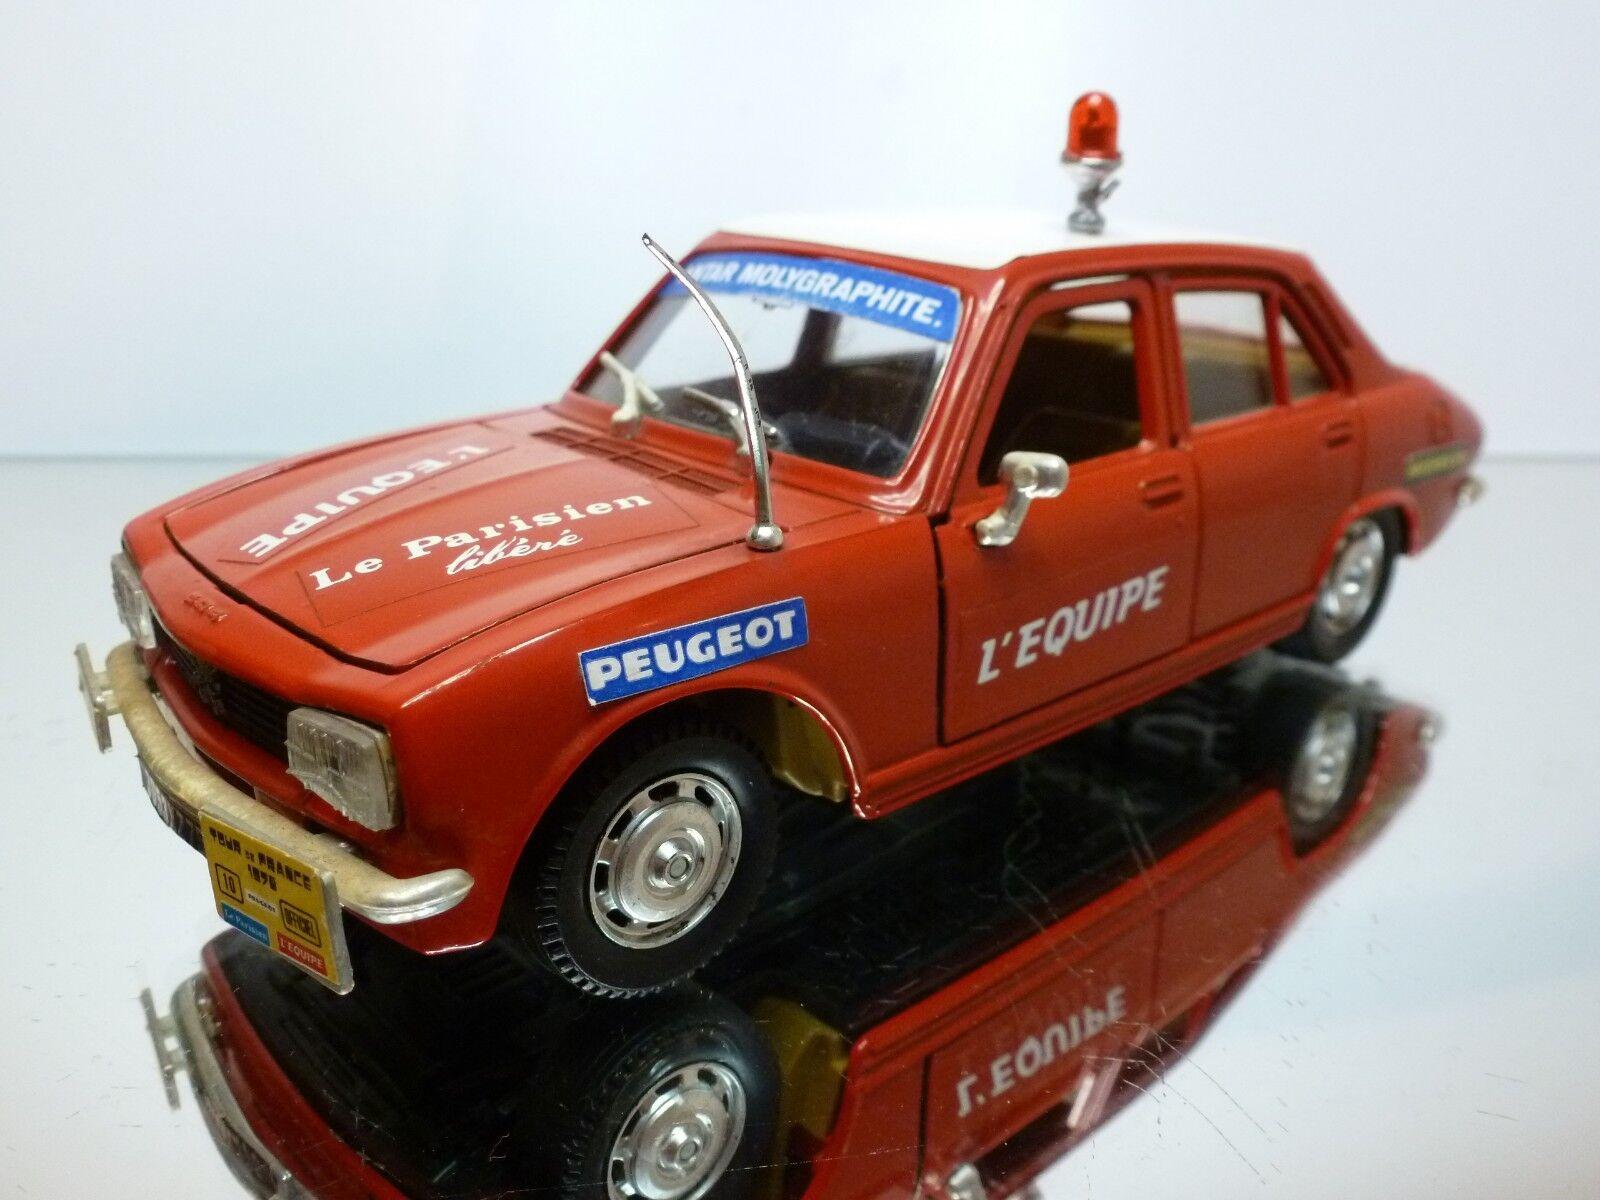 POLISTIL S48 PEUGEOT 504 GL L'EQUIPE TOUR DE FRANCE 1975 - rouge 1 26 - GOOD